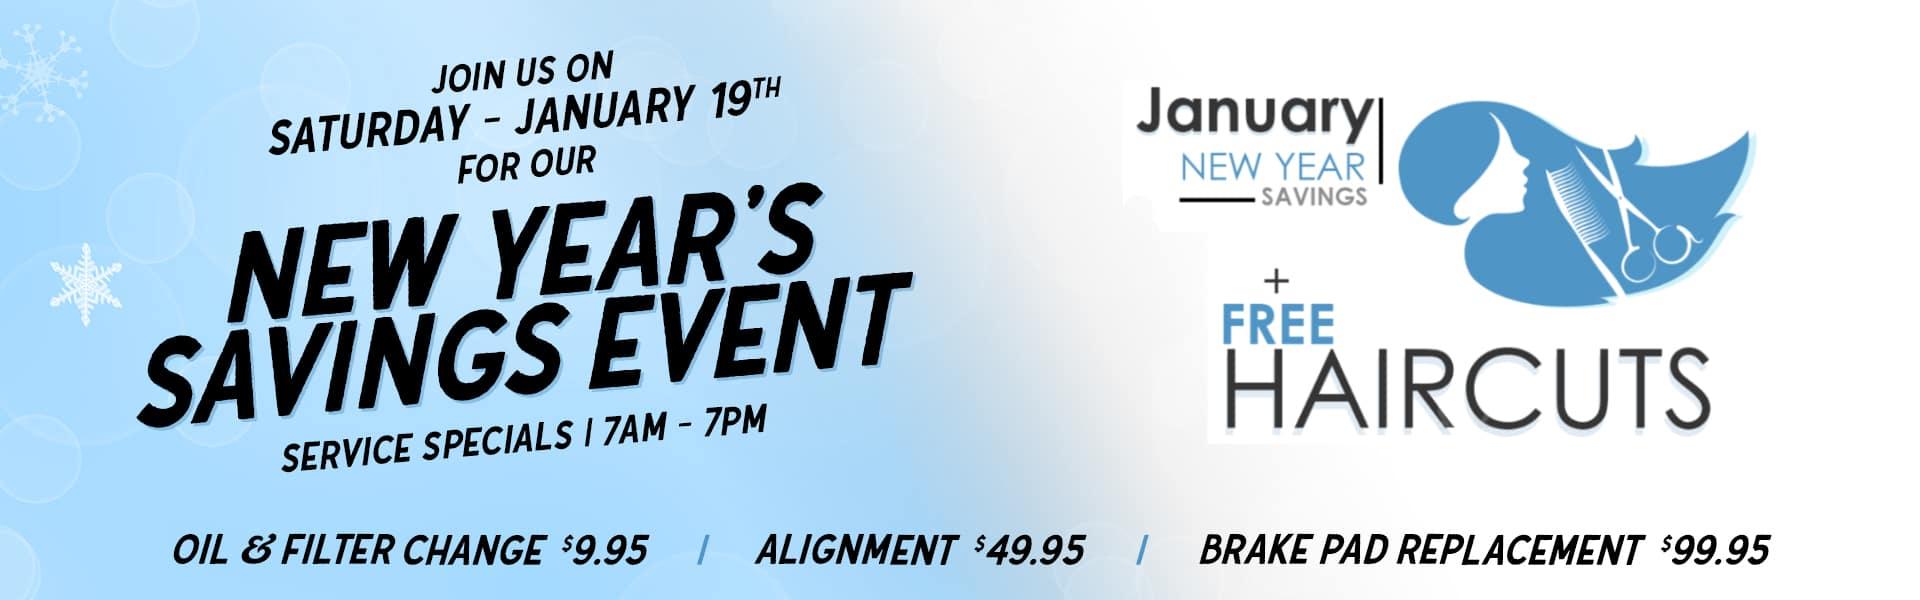 New-Years-Savings-Event